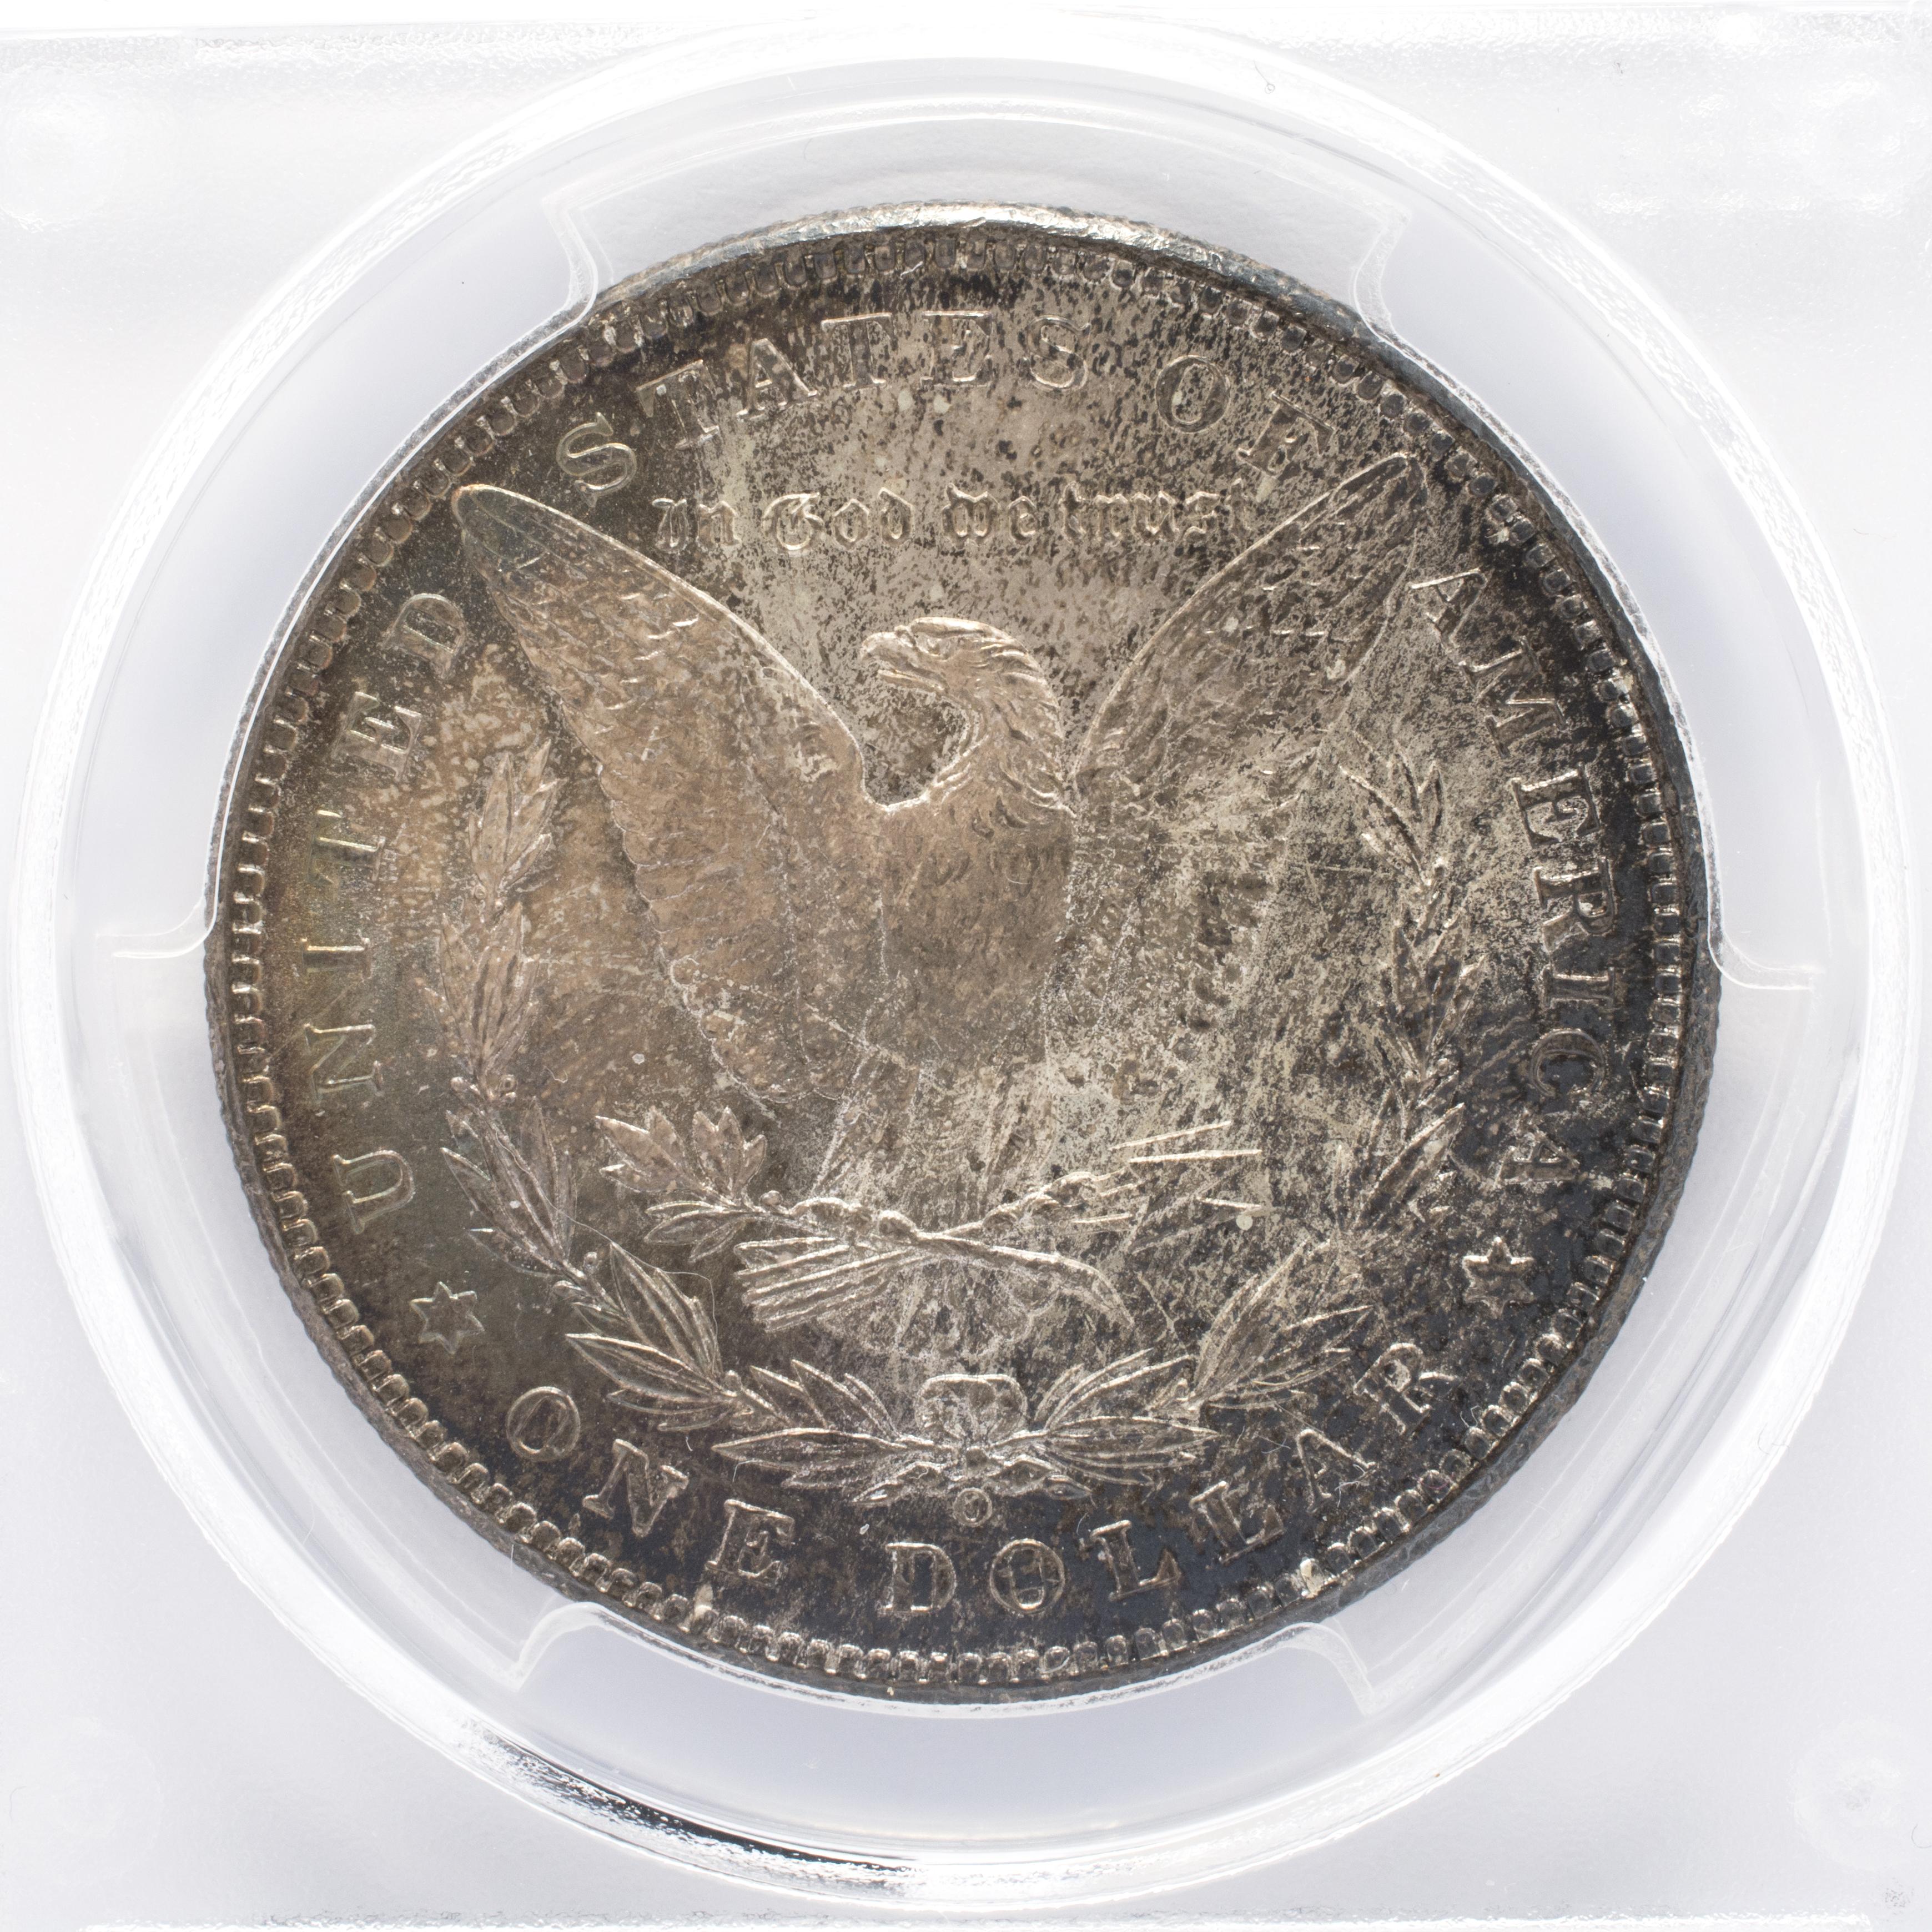 1898-O_$1_PCGS_MS_64_7254-64-31644700_Reverse